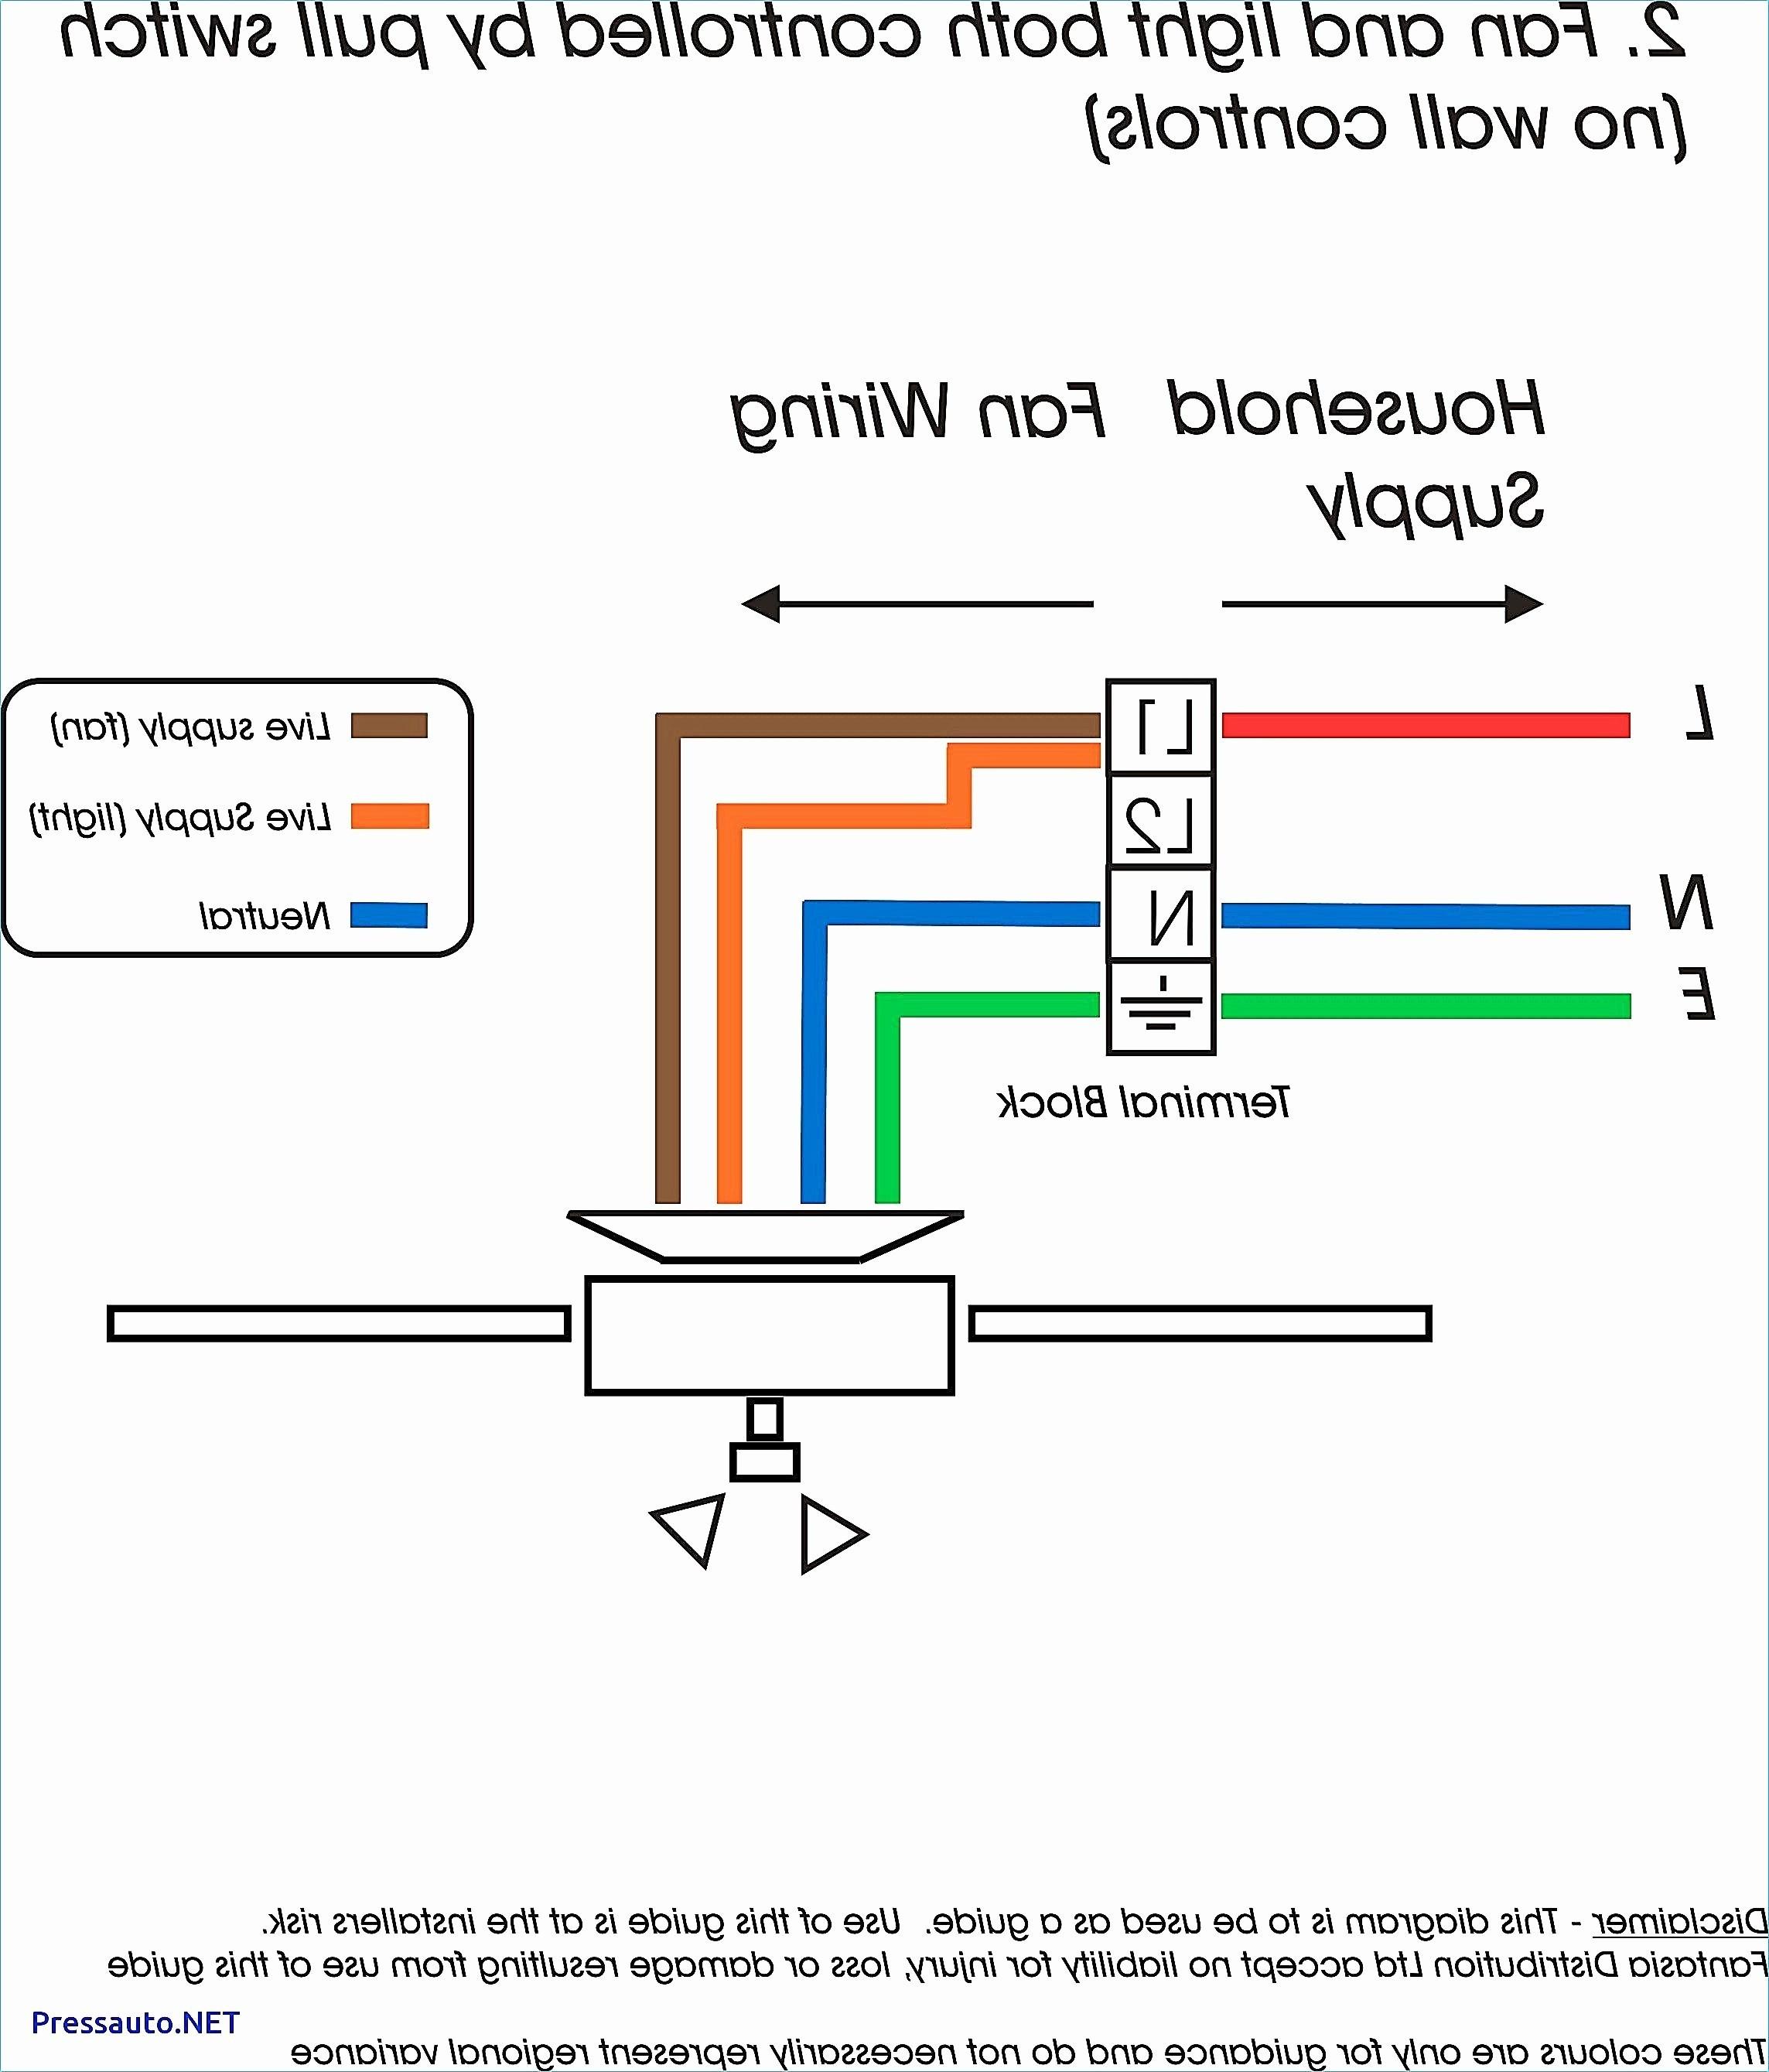 Power Acoustik Gothic Gw-124 Wiring Diagram from i0.wp.com